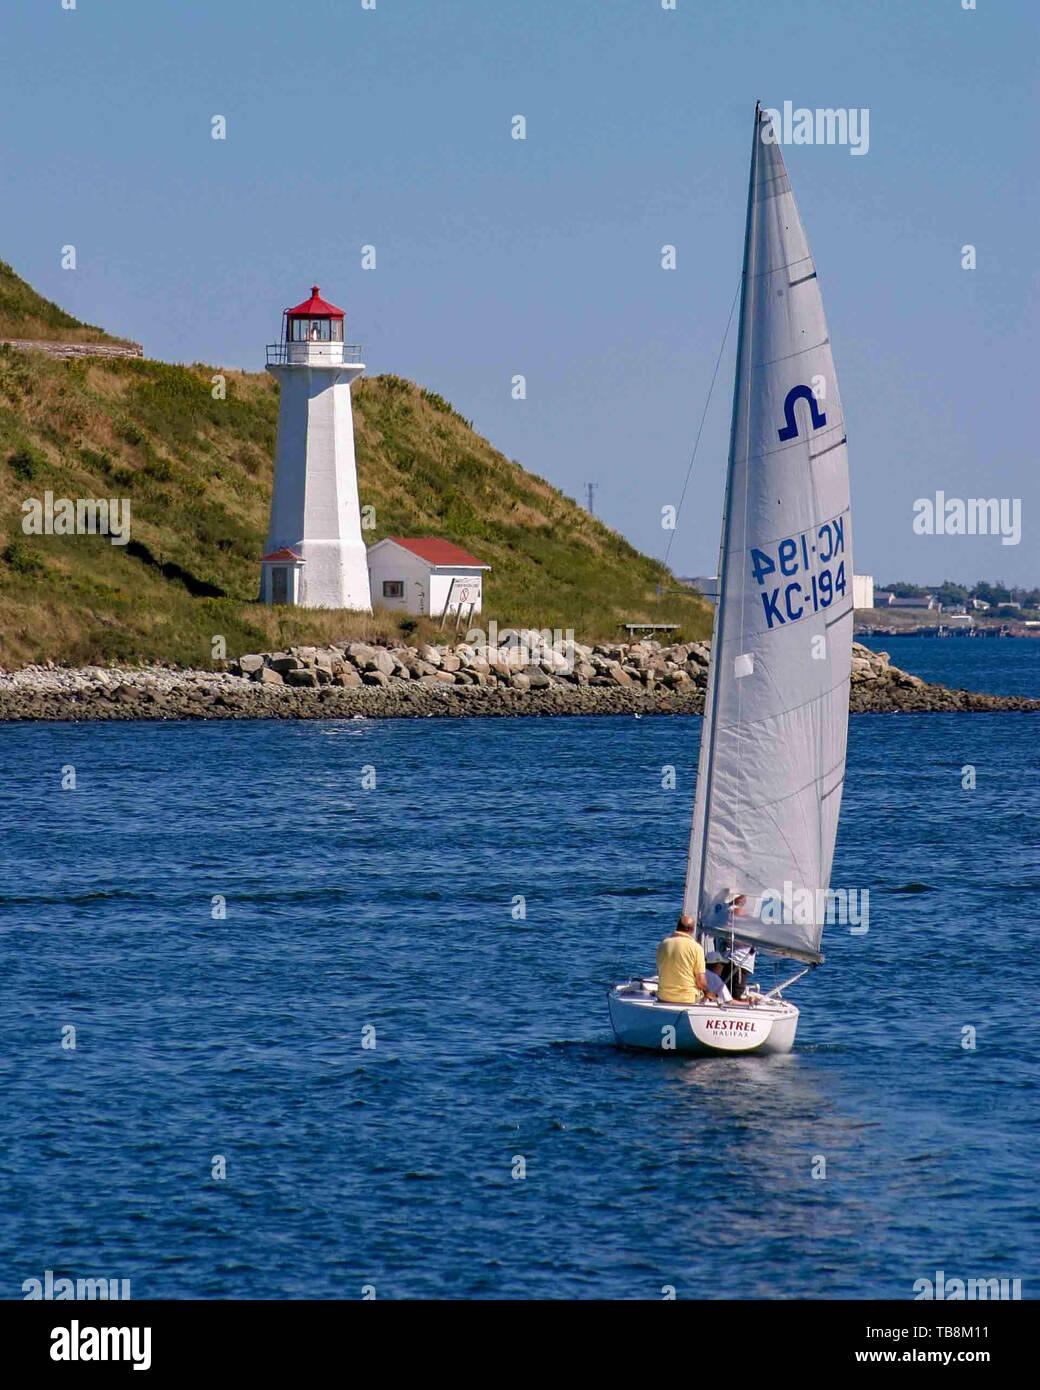 Halifax, Nova Scotia, Canada  5th Sep, 2005  Sailing in